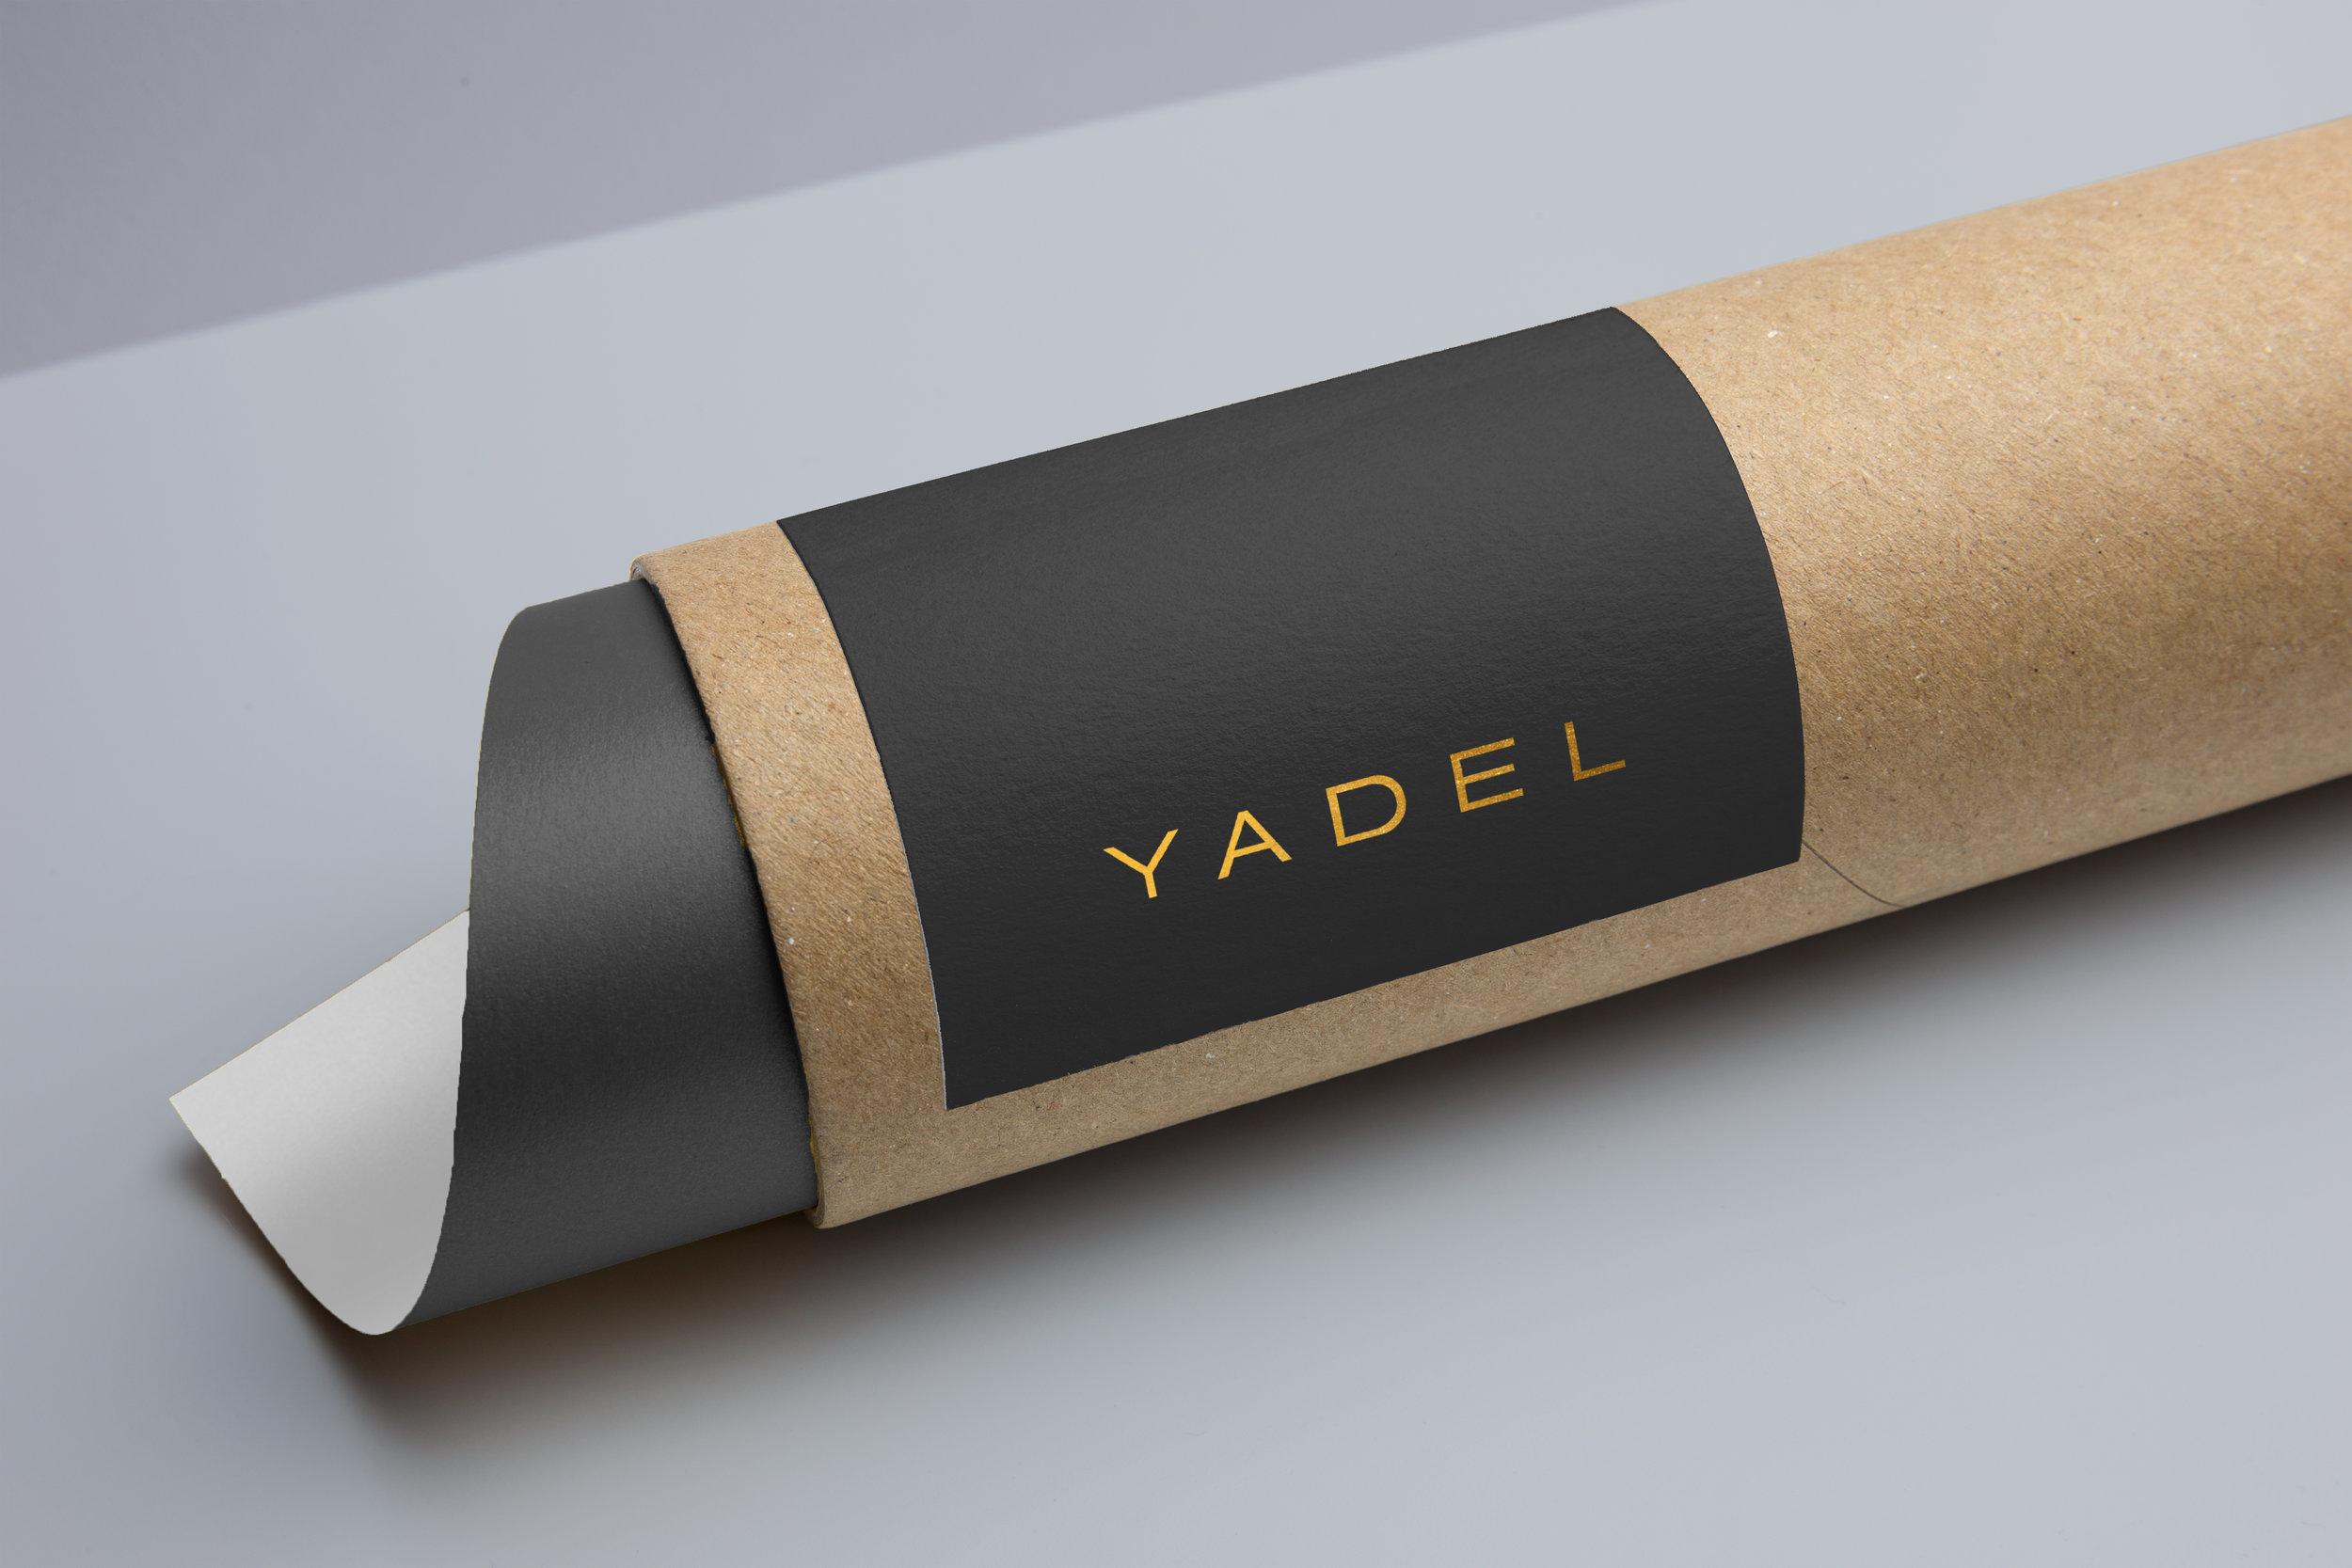 YADEL Packaging TubeMockup.jpg